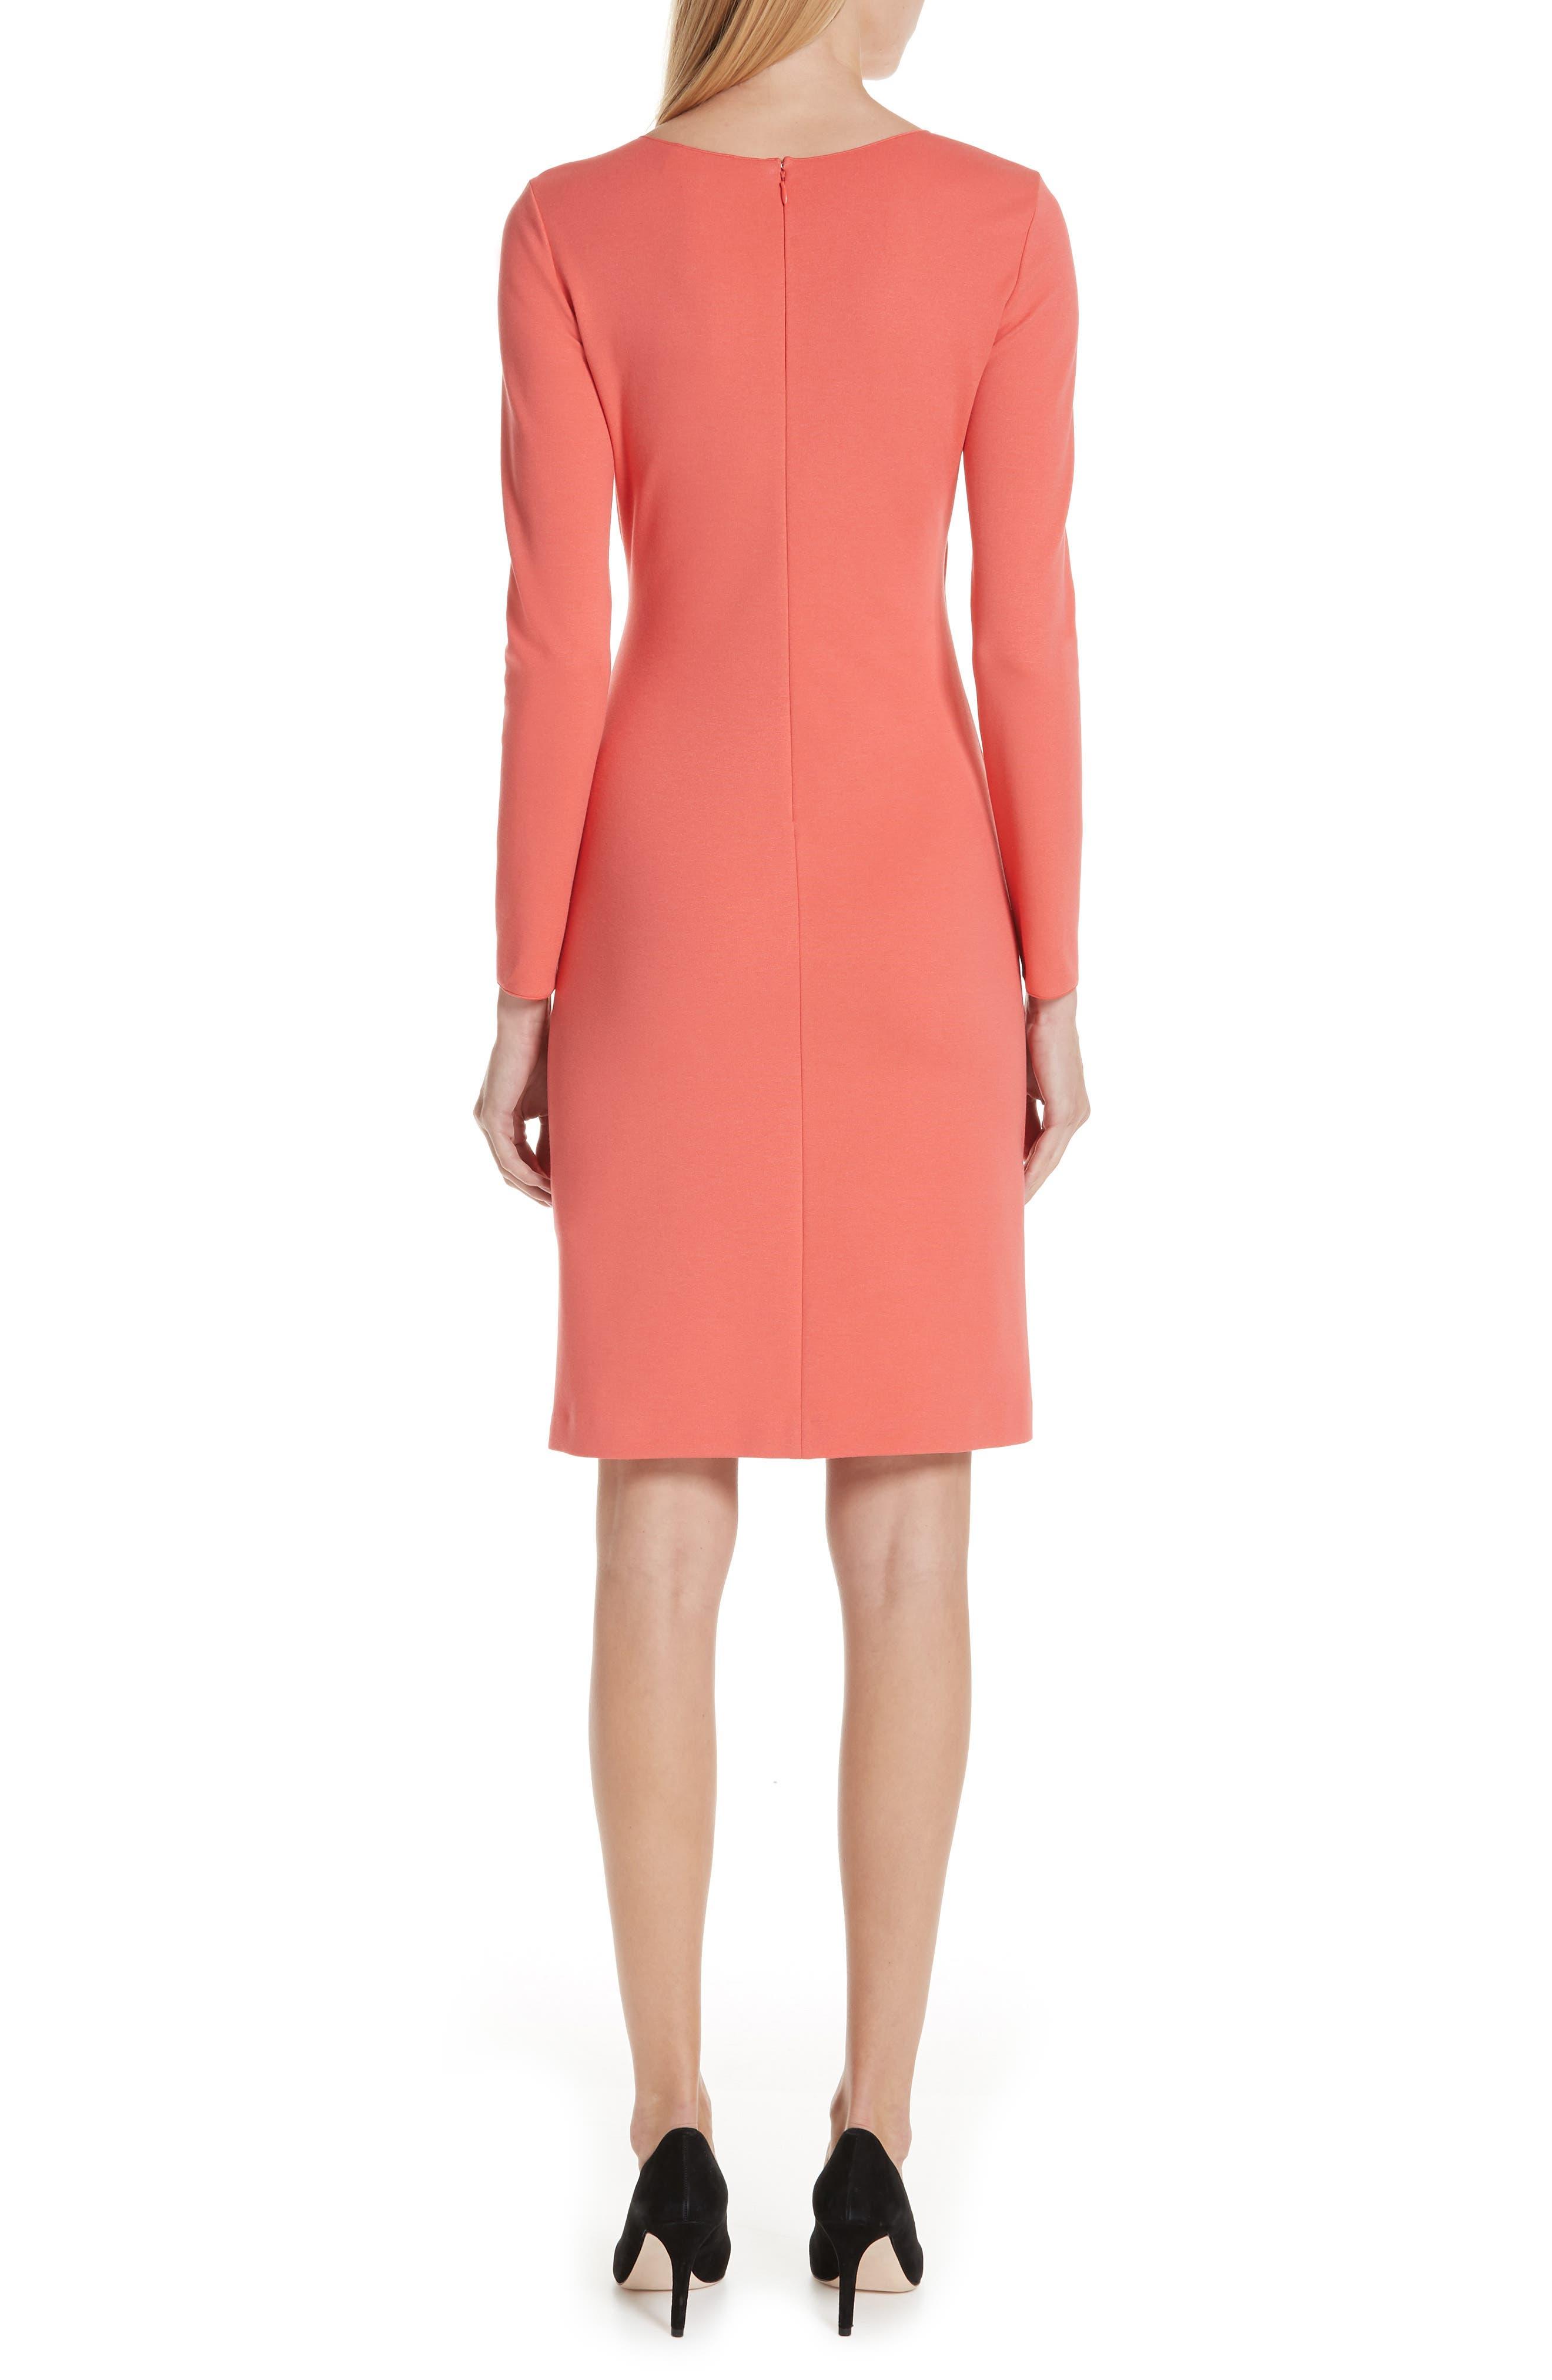 EMPORIO ARMANI,                             Punto Milano Faux Wrap Dress,                             Alternate thumbnail 2, color,                             SUNRISE RED